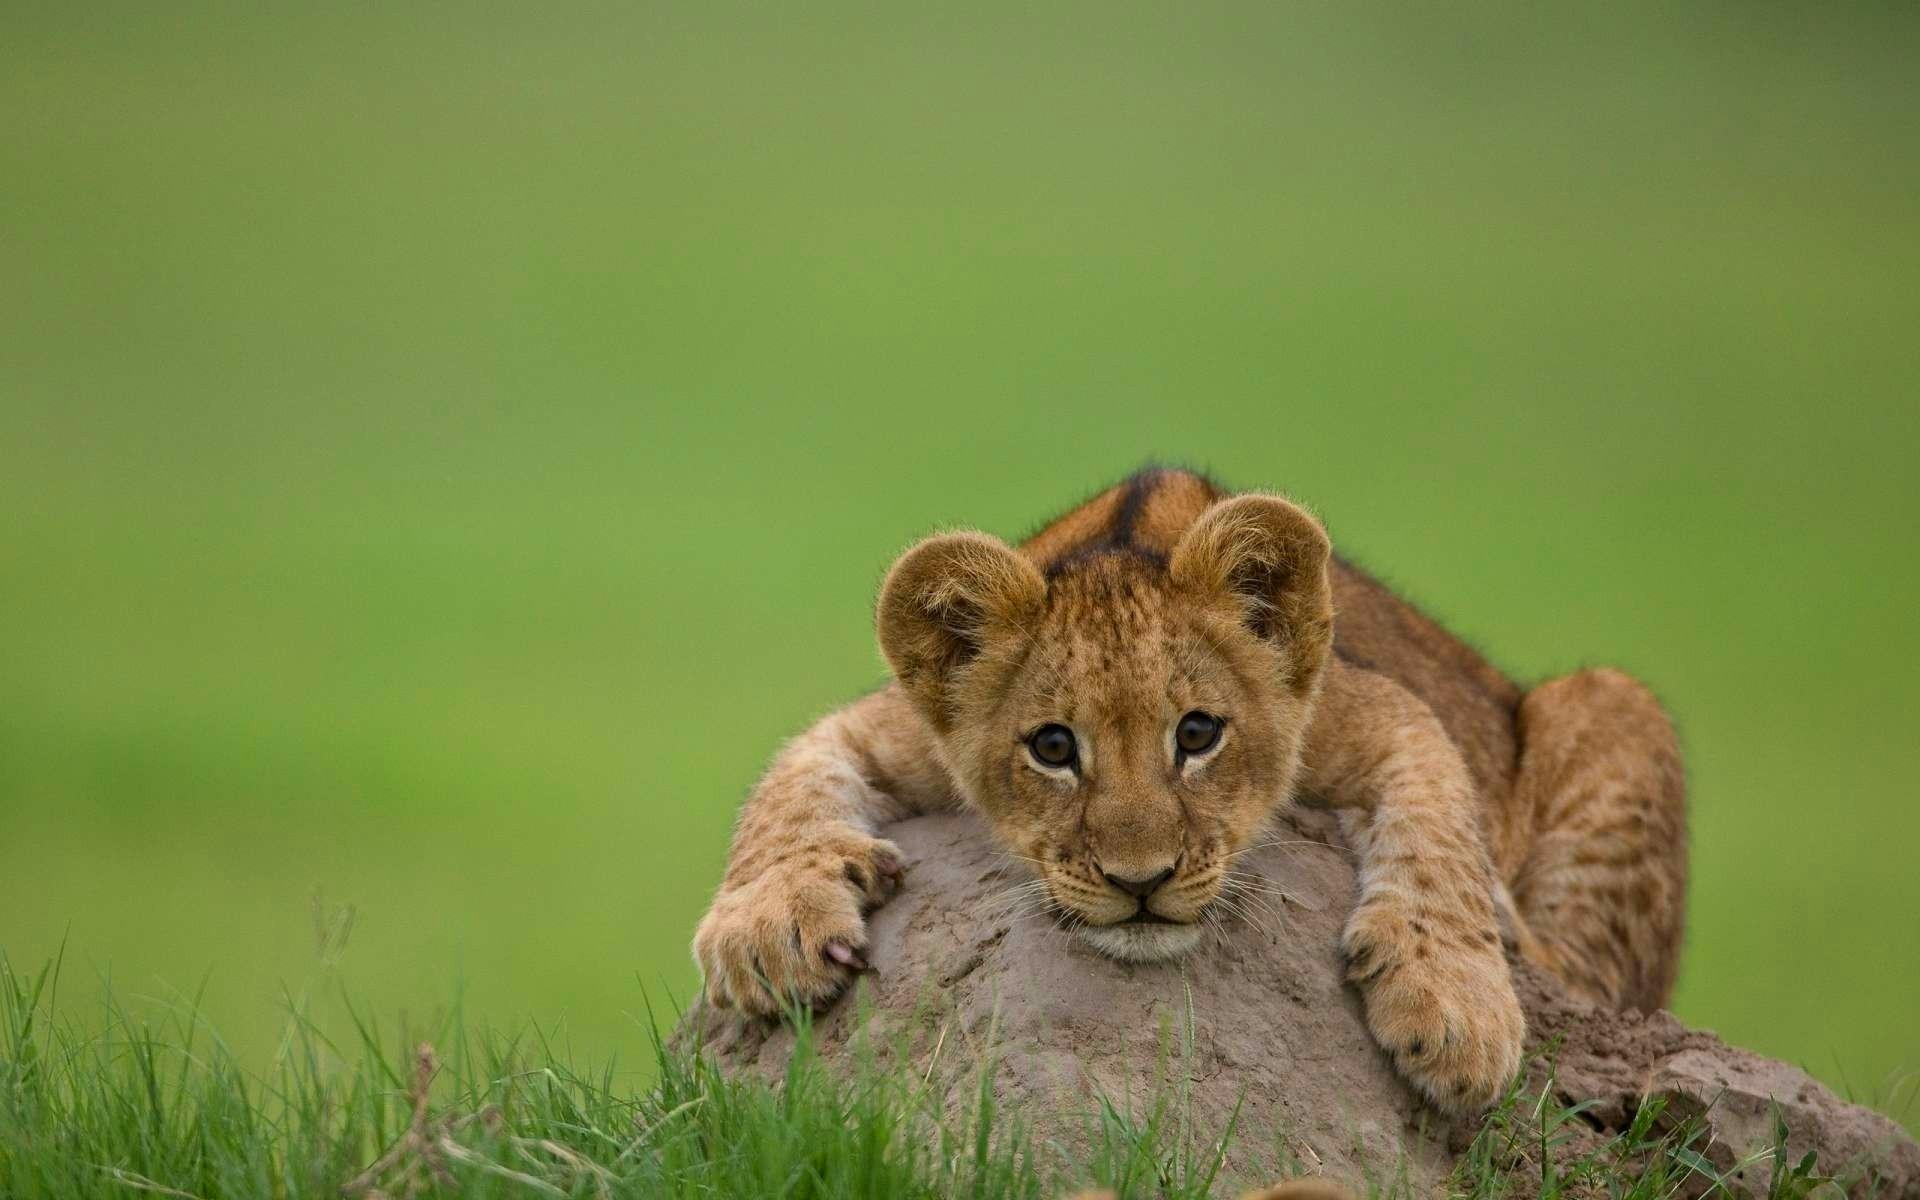 Lion cub cute